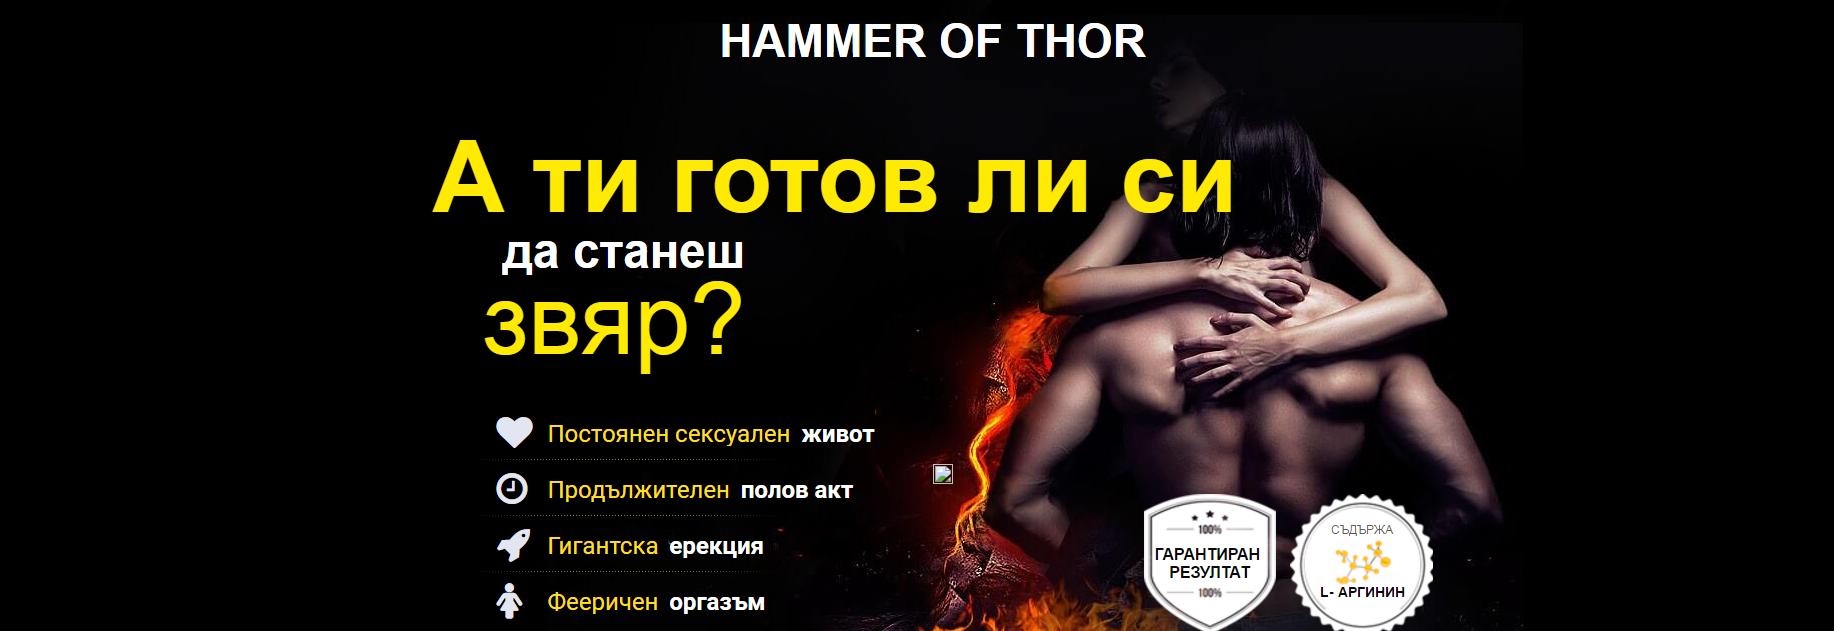 hammer-thor-bulgaria